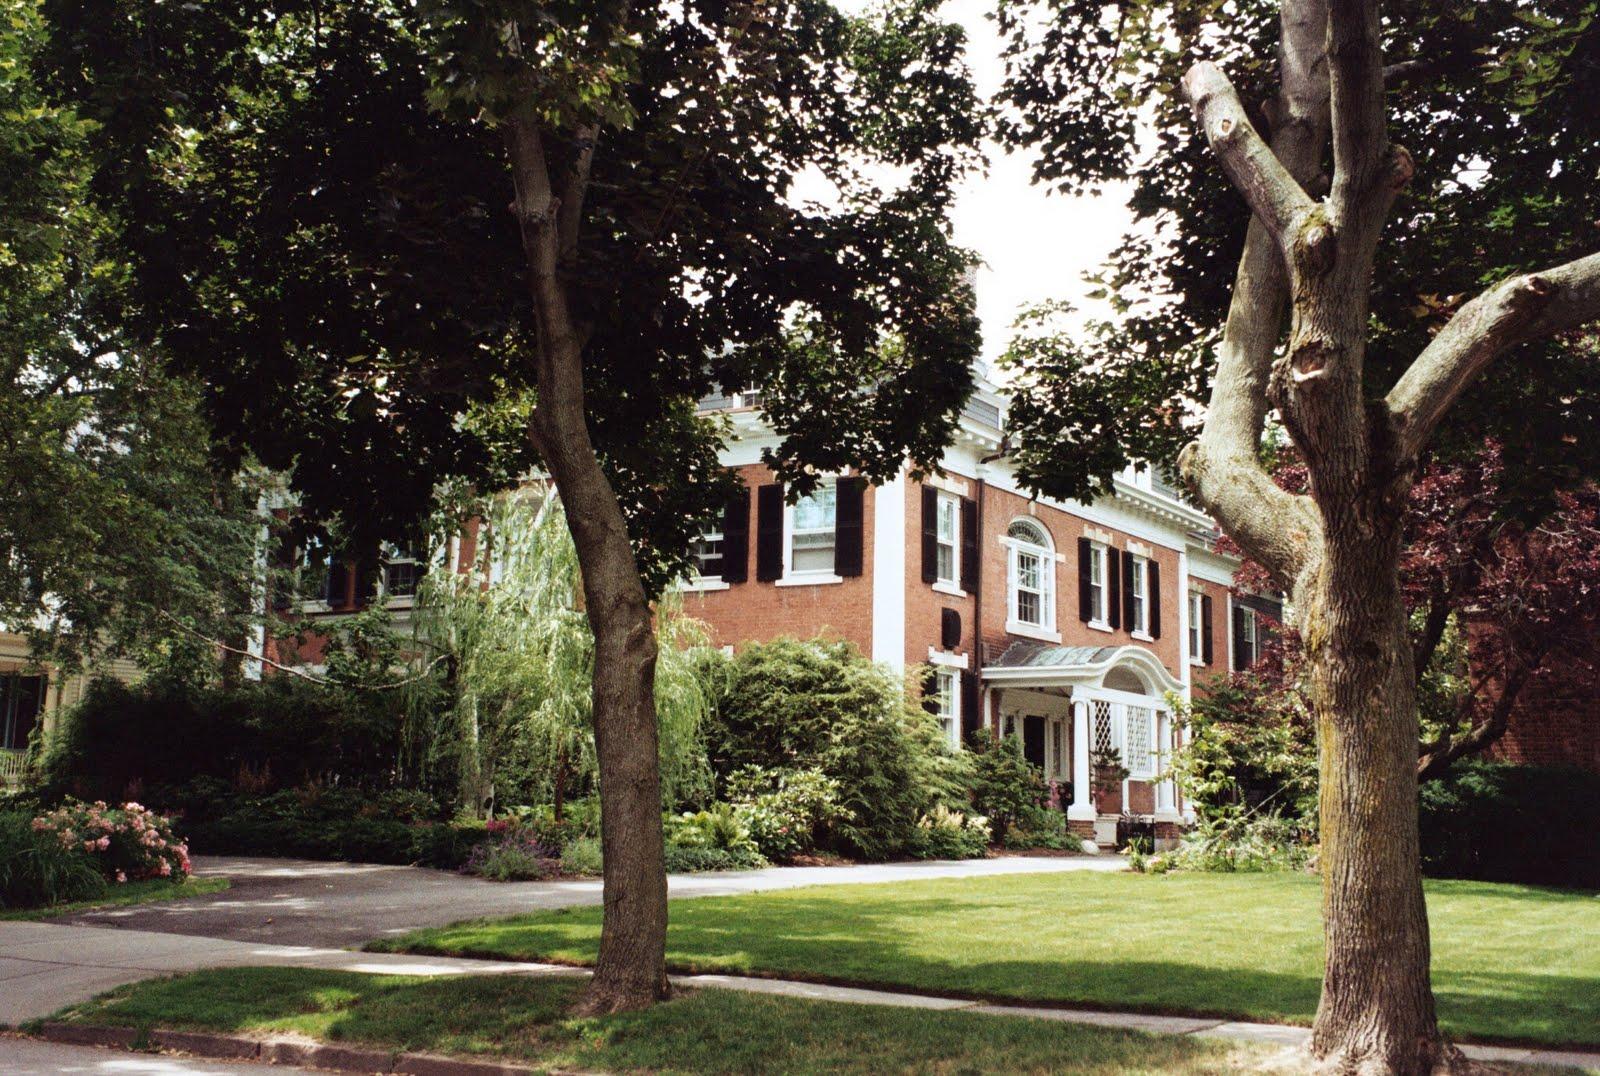 J Buffalo House Jax Stumpes: Architect...